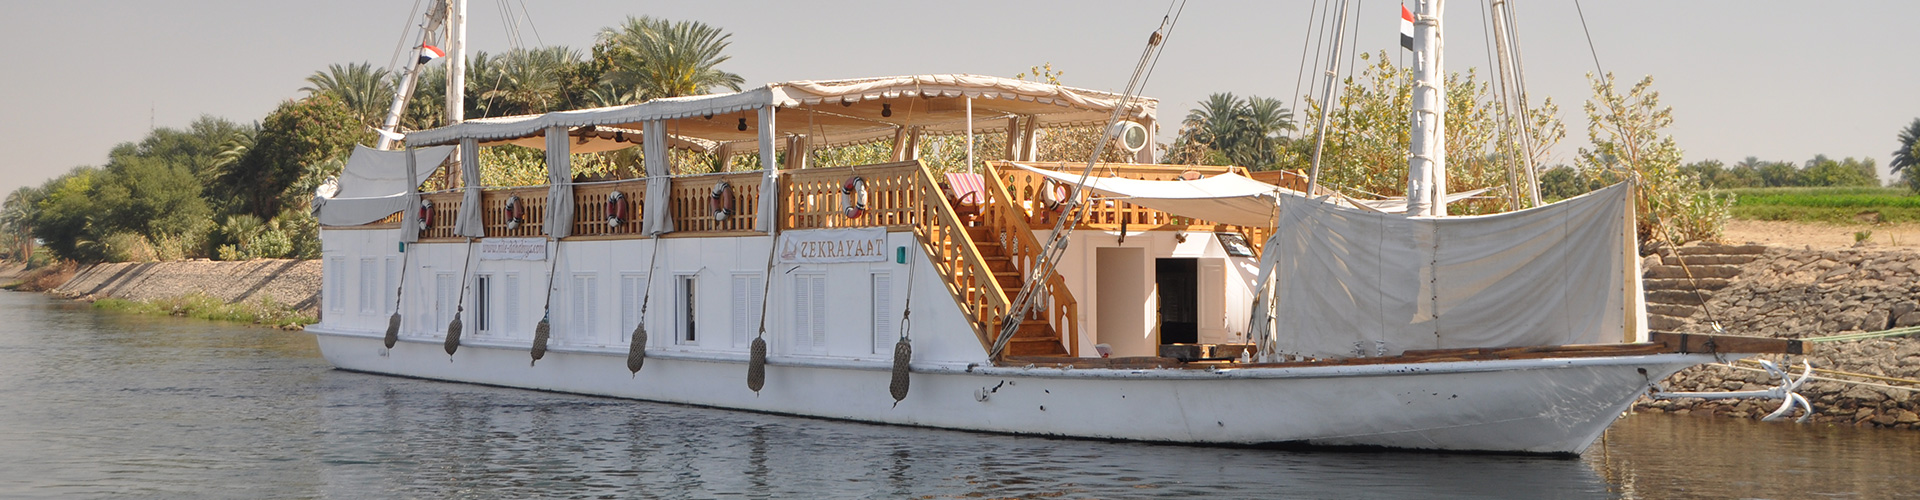 Egypt Dahabiya Nile River Cruise – Limited Edition